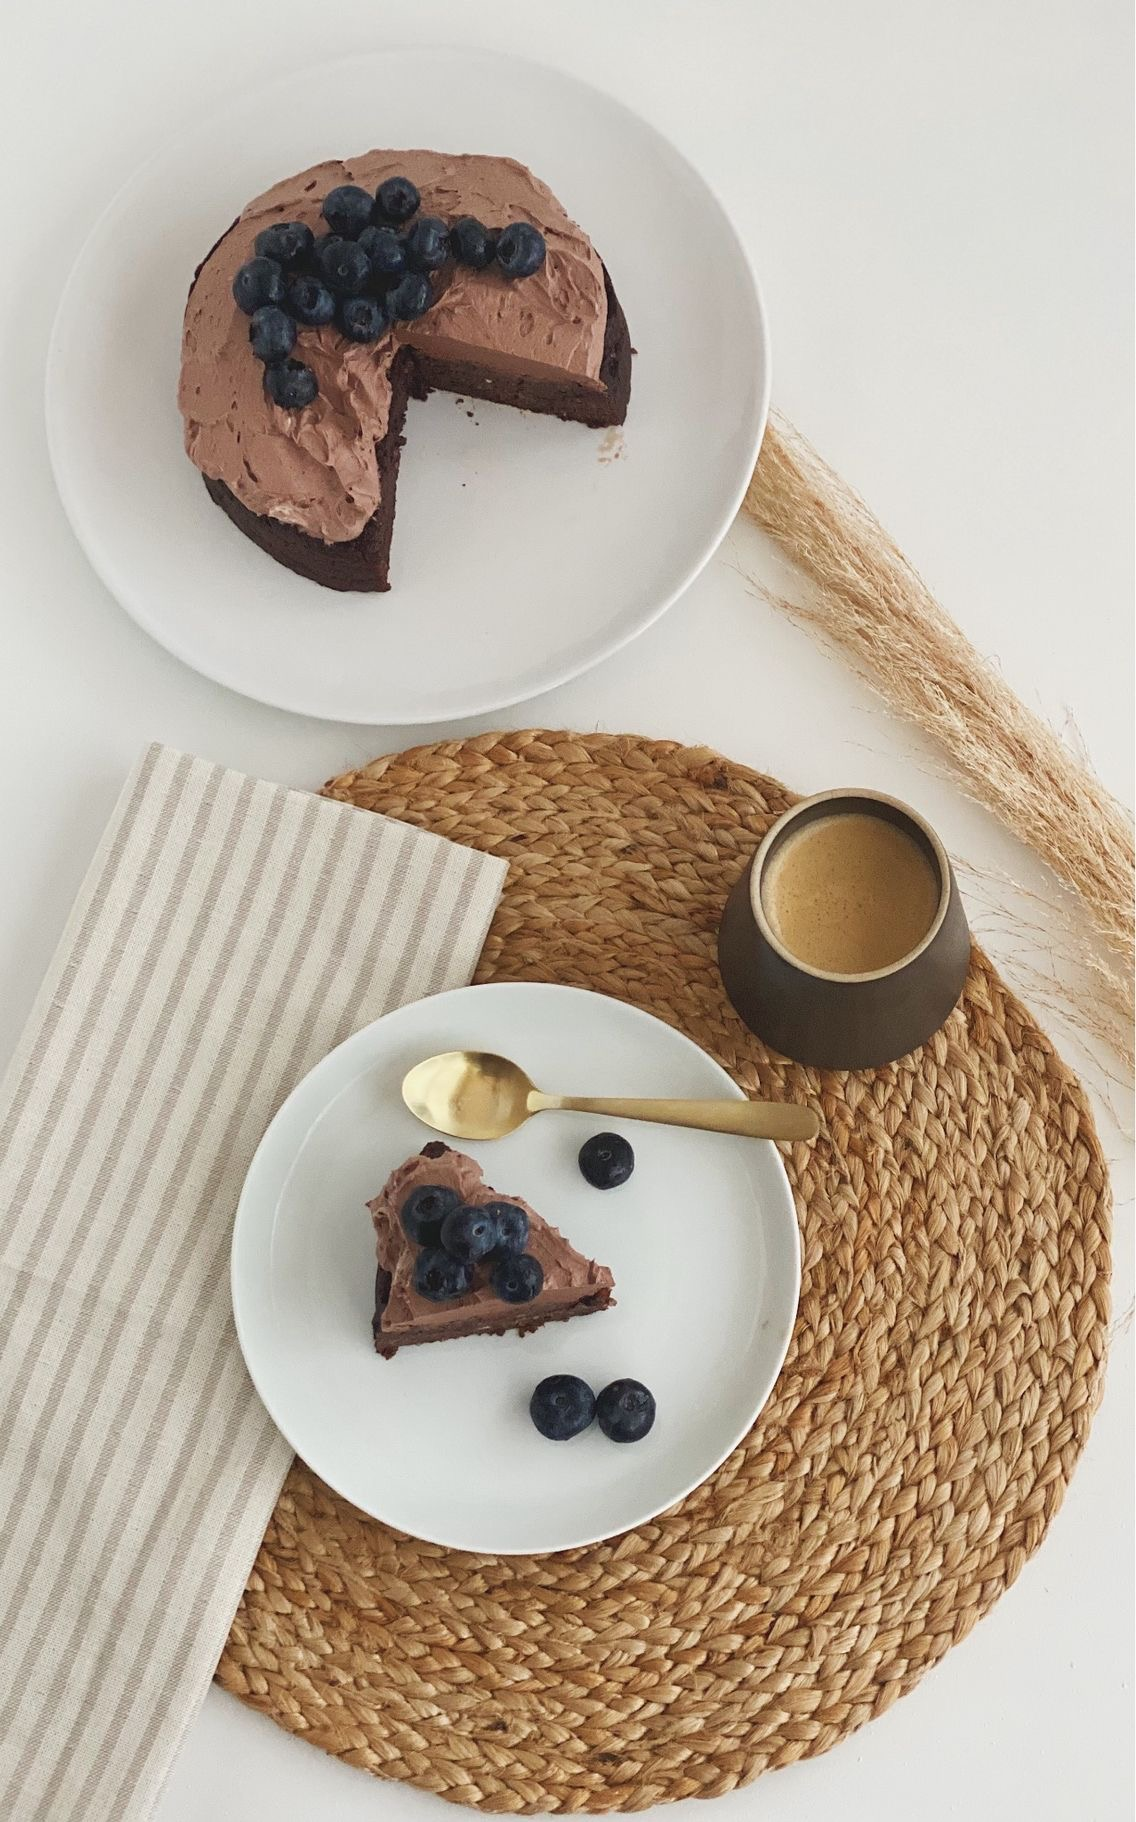 Chokoladekage med avocado med kakaosmørcreme og pyntet med blåbær på toppen, set oppefra og den hele kage ses + et enkelt stykke for sig selv og en kop kaffe som står på en siv dækkeserviet